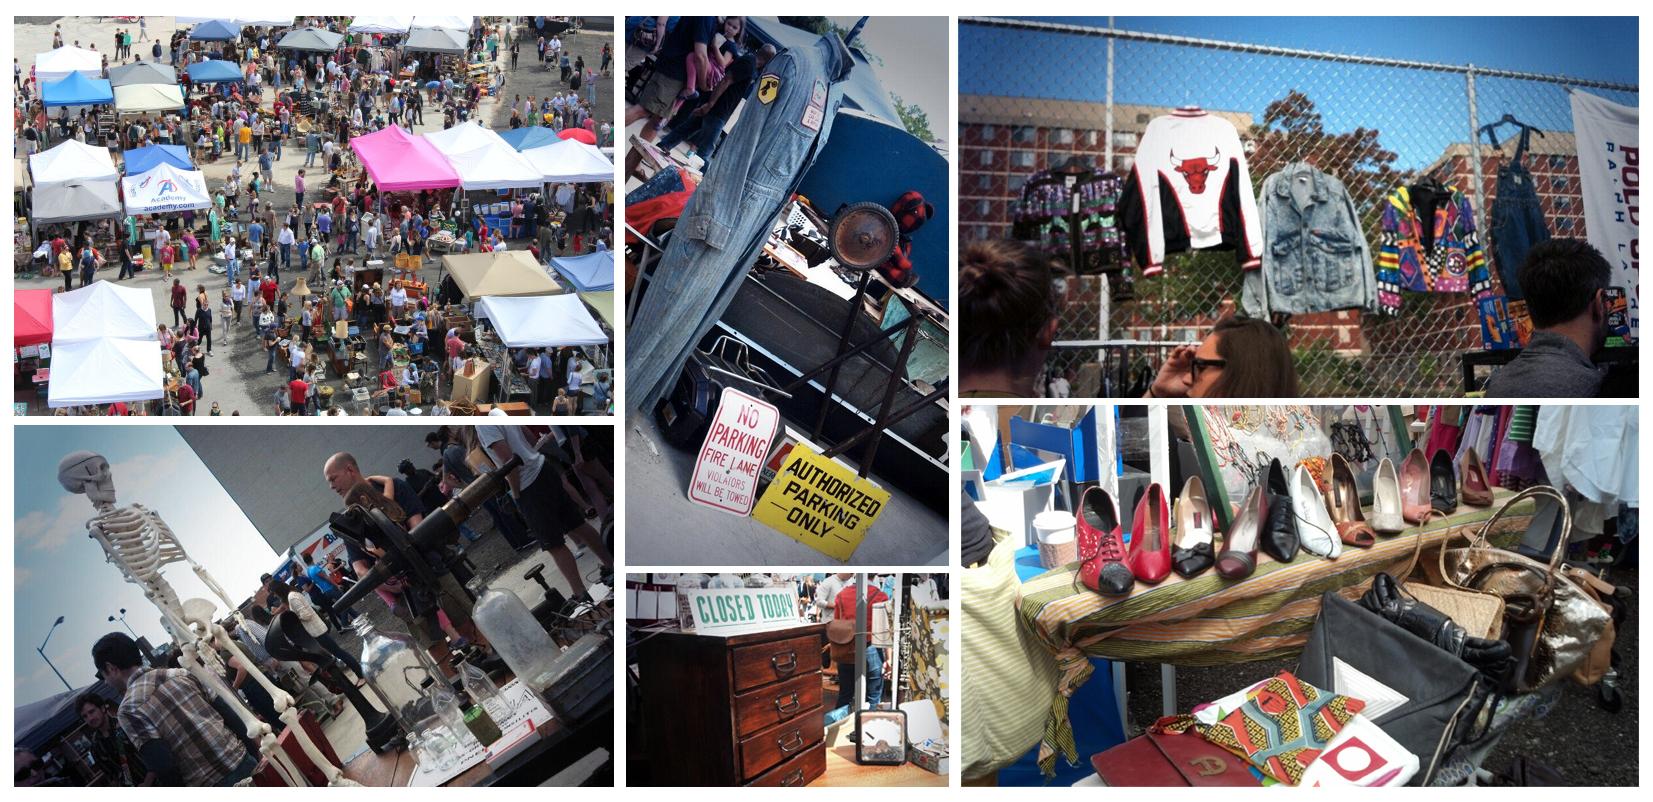 Coupon festival flea market